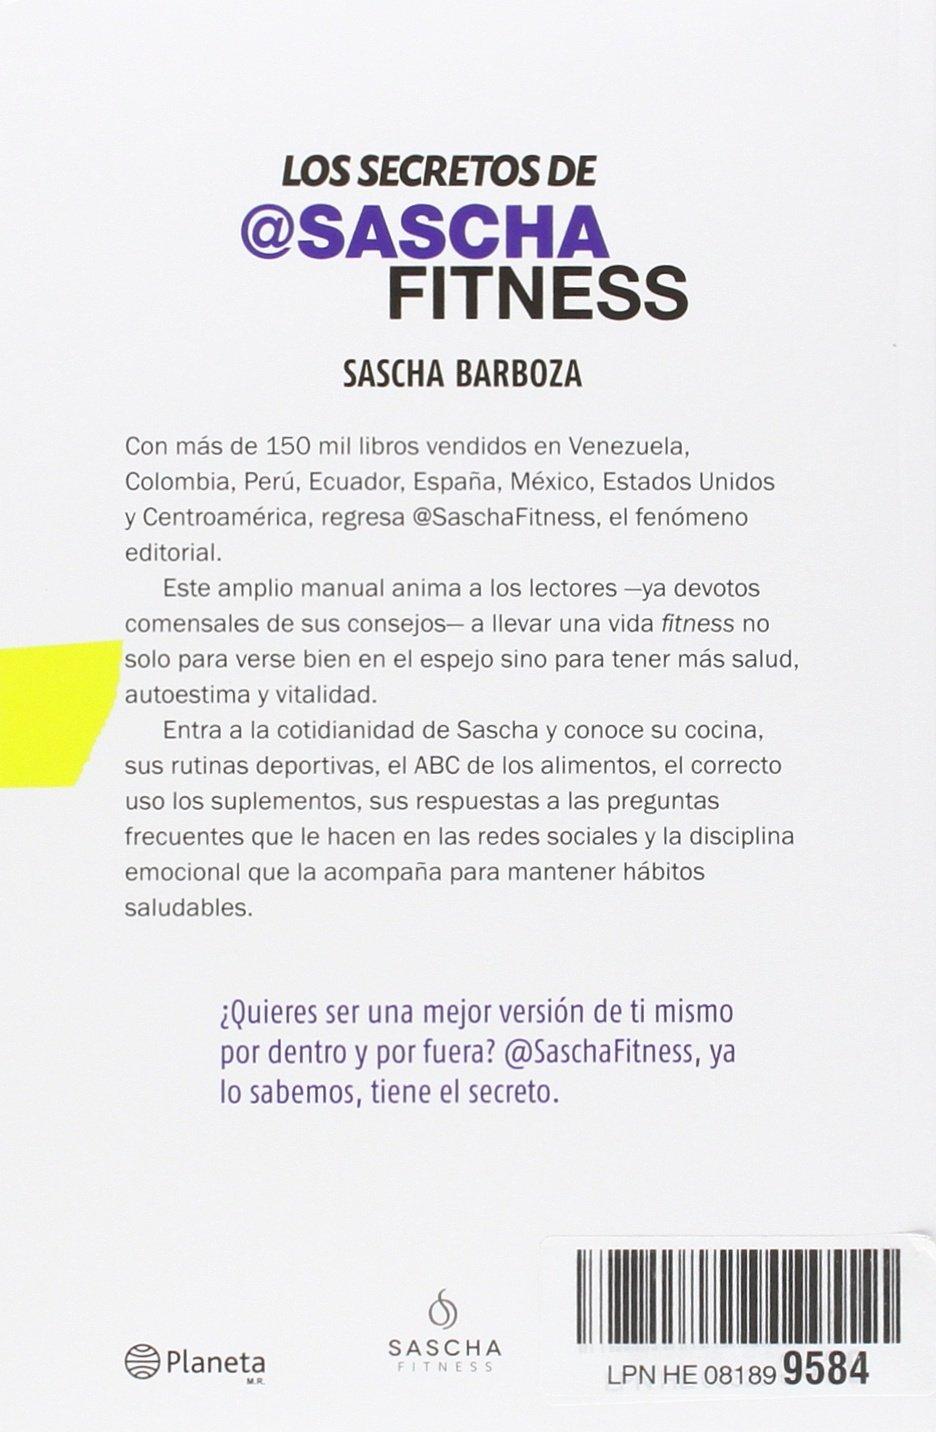 Los secretos de sascha fitness spanish edition sascha barboza los secretos de sascha fitness spanish edition sascha barboza 9786070732584 amazon books fandeluxe Images